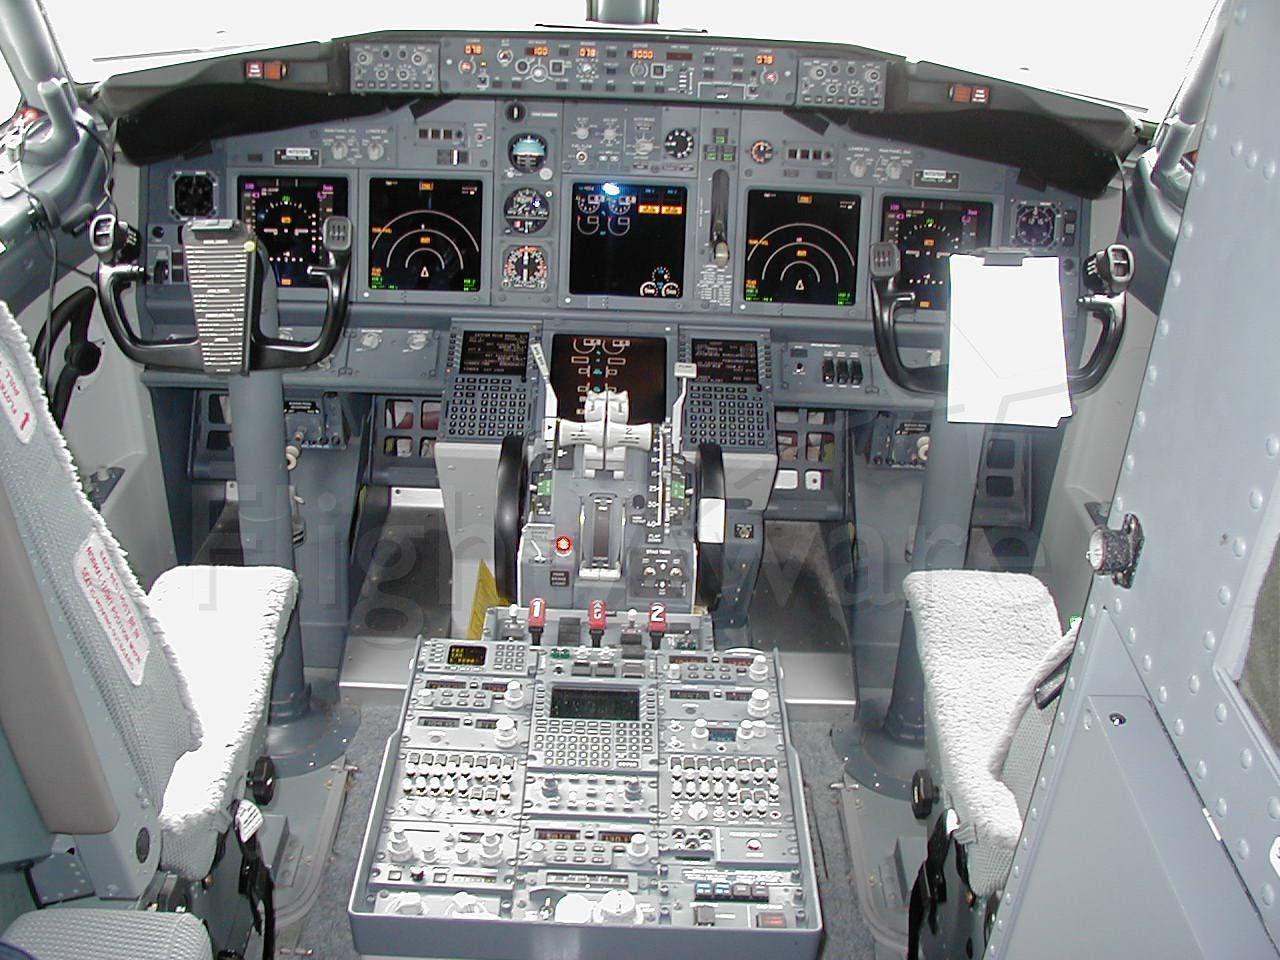 Boeing 737-700 (N737ER)